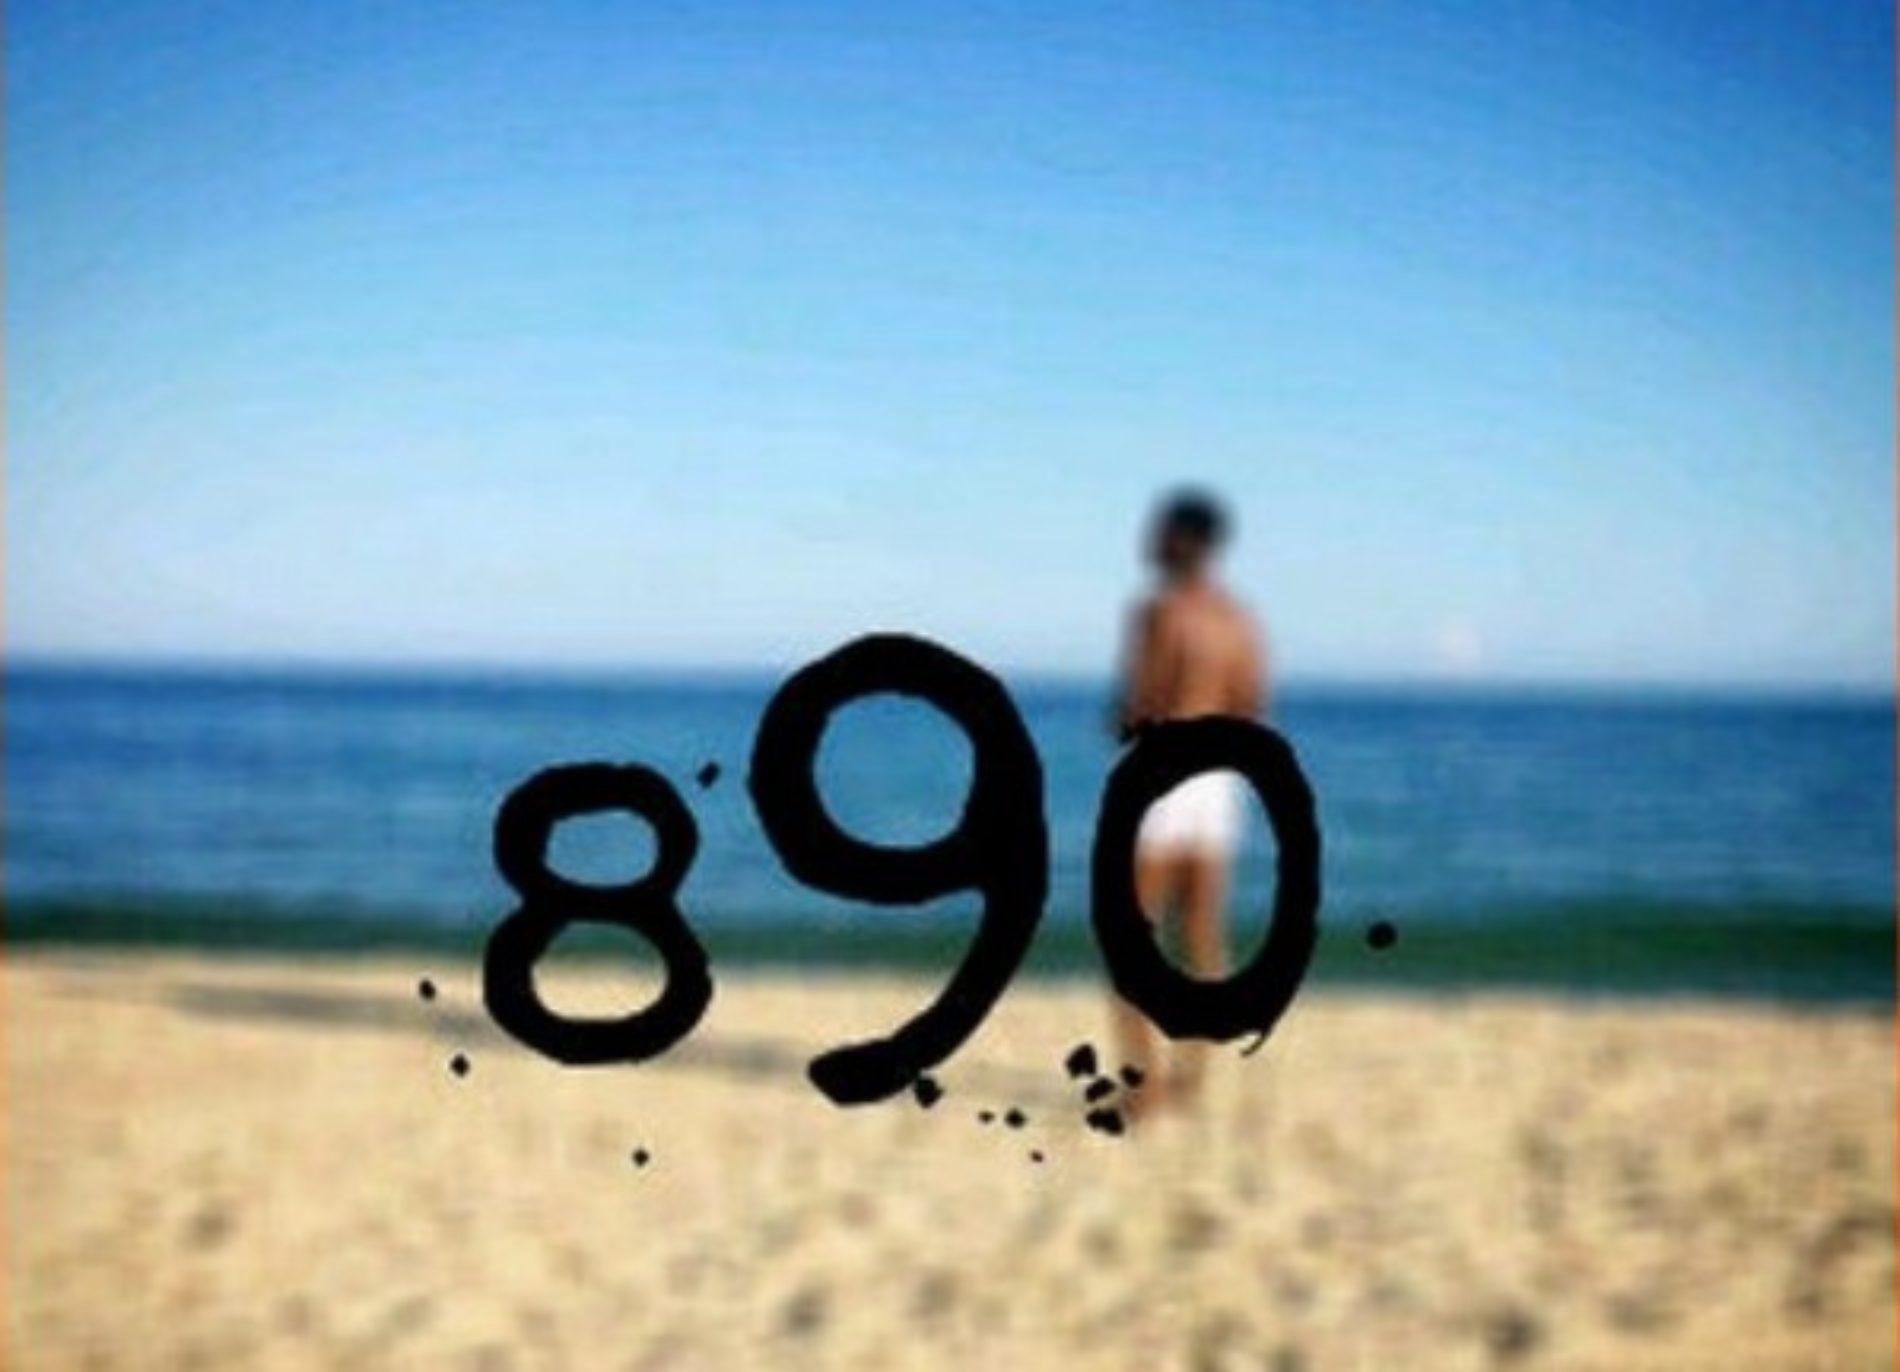 890-2